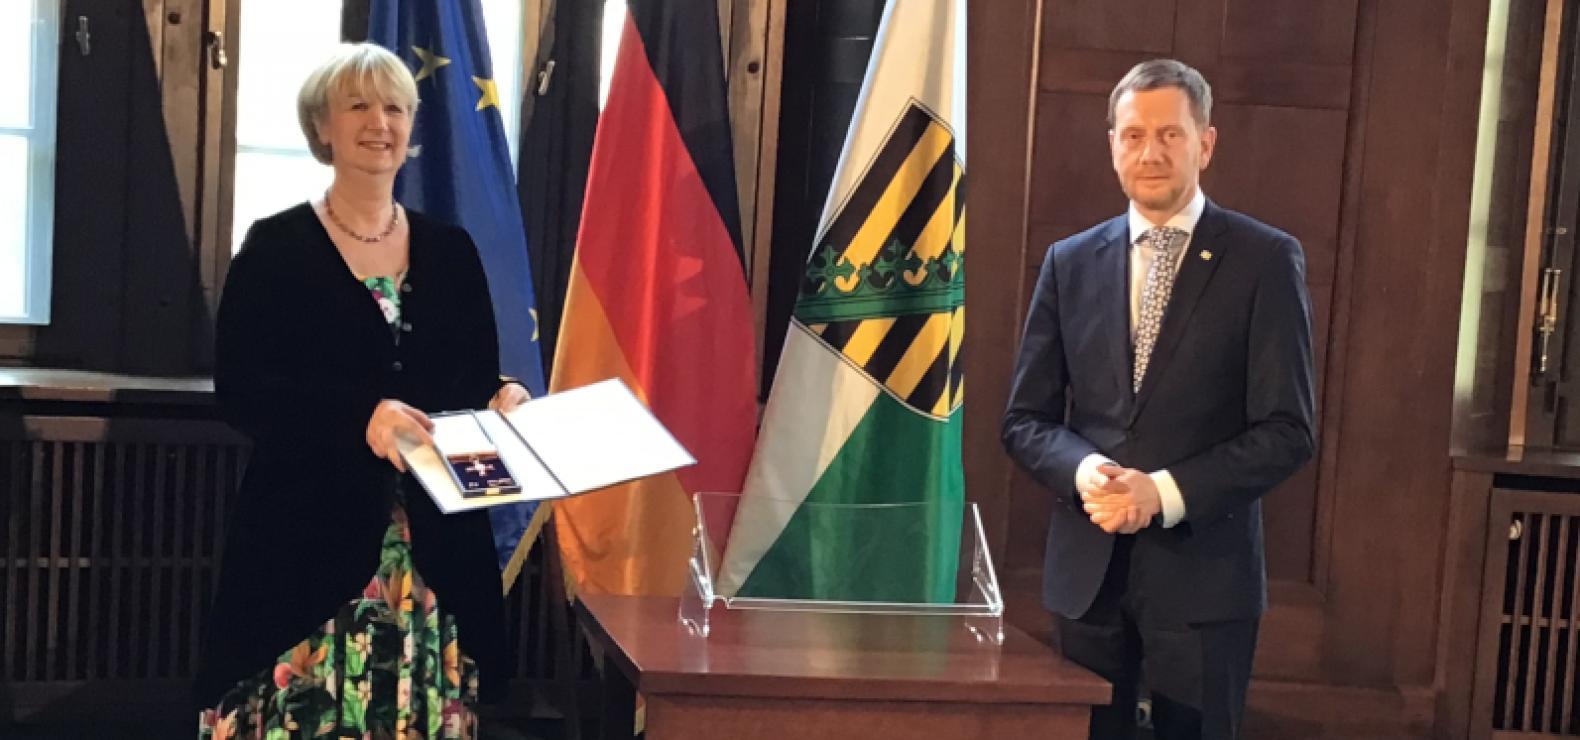 Bundesverdienstkreuz für Sylvia Urban